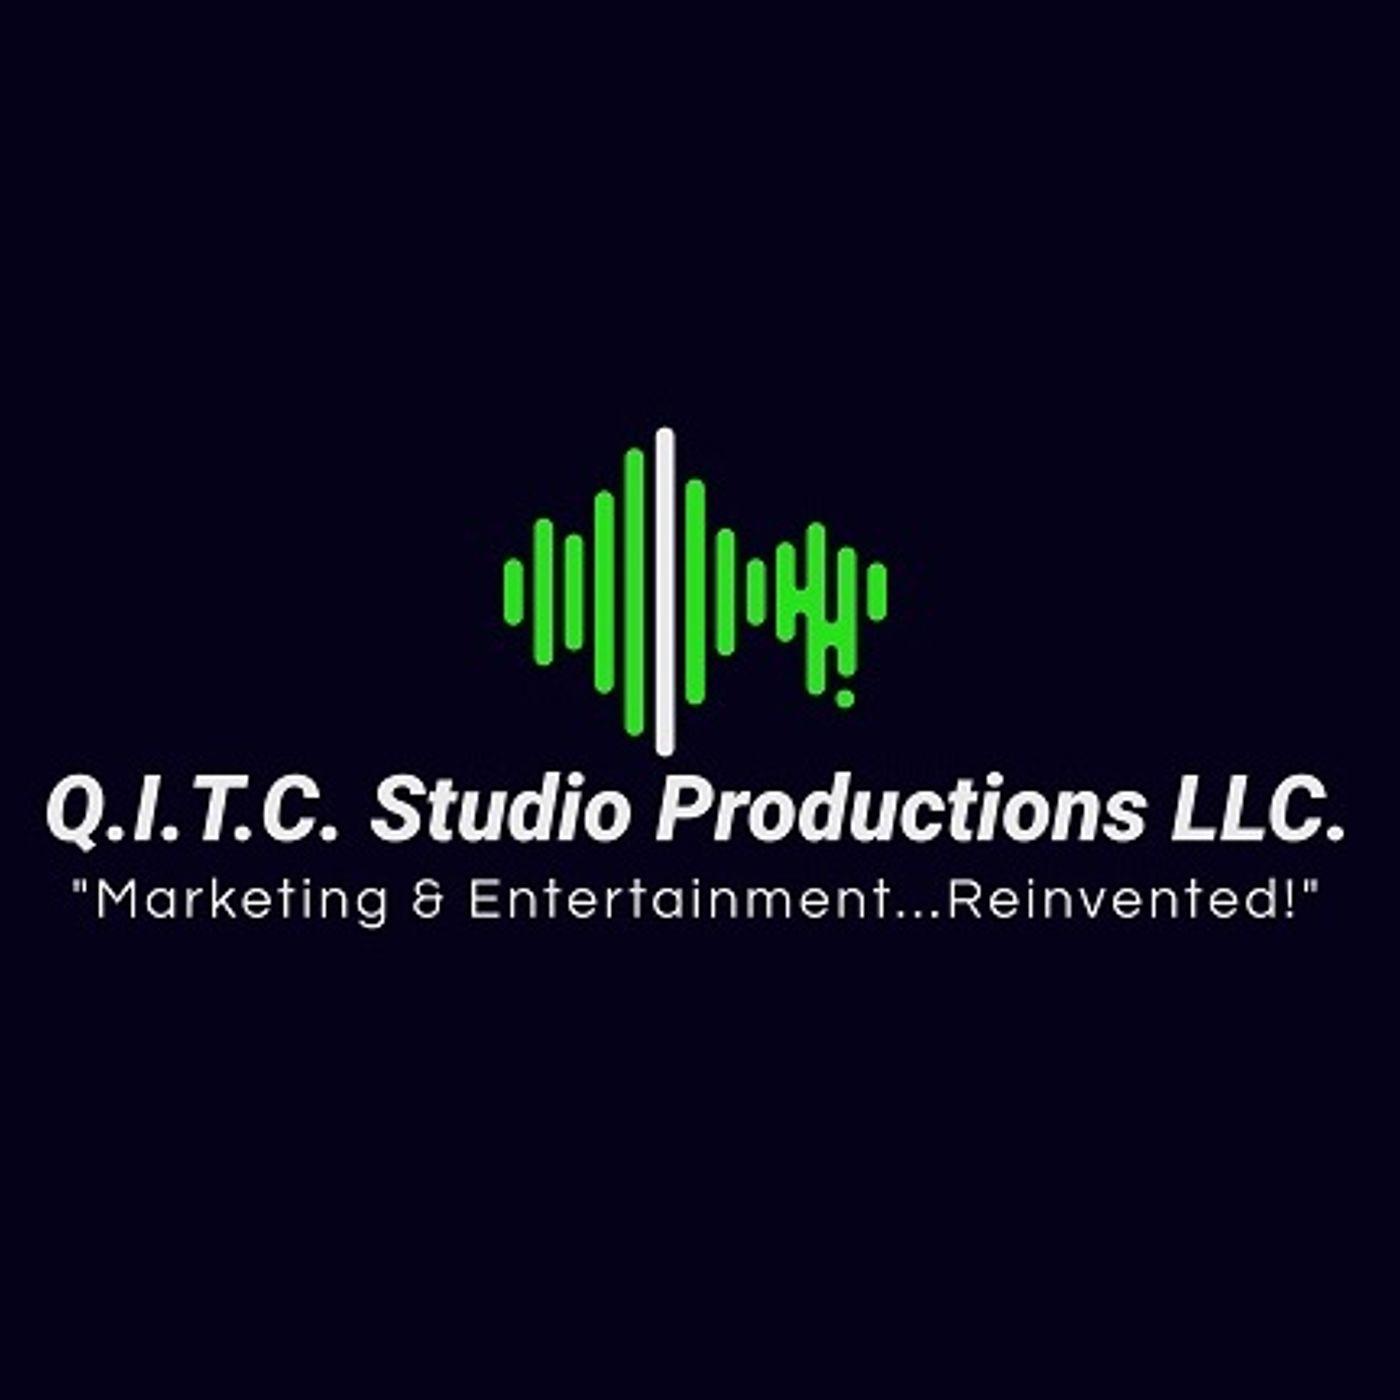 Q.I.T.C. Studio Productions